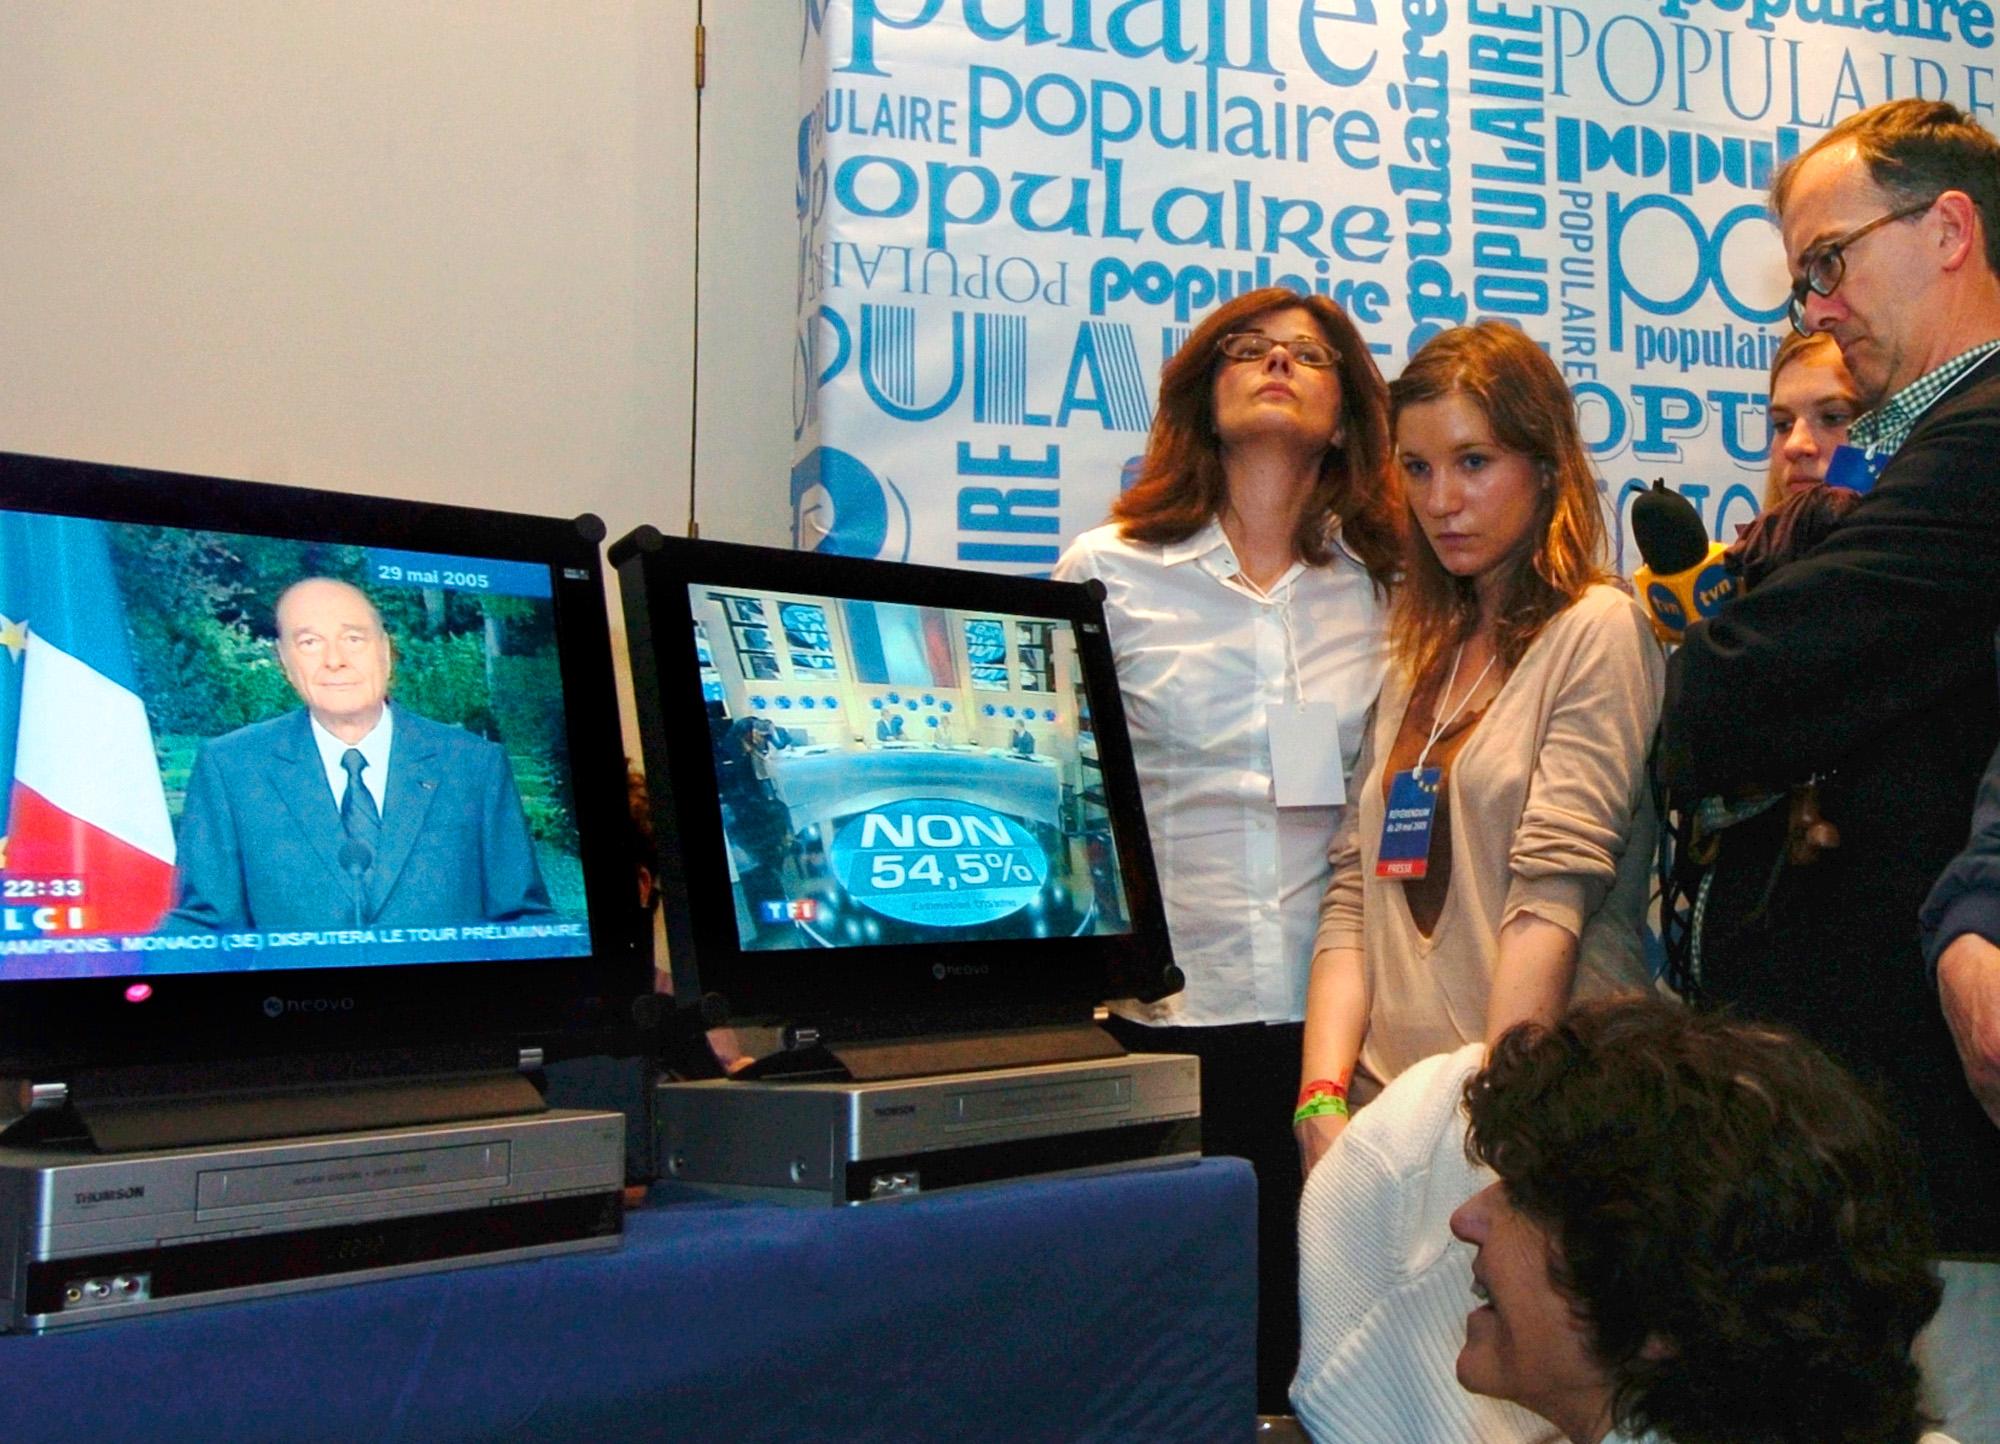 Nederlagsstemning under valgvaken til president Chiracs parti, UMP. (Foto: AP/Scanpix)